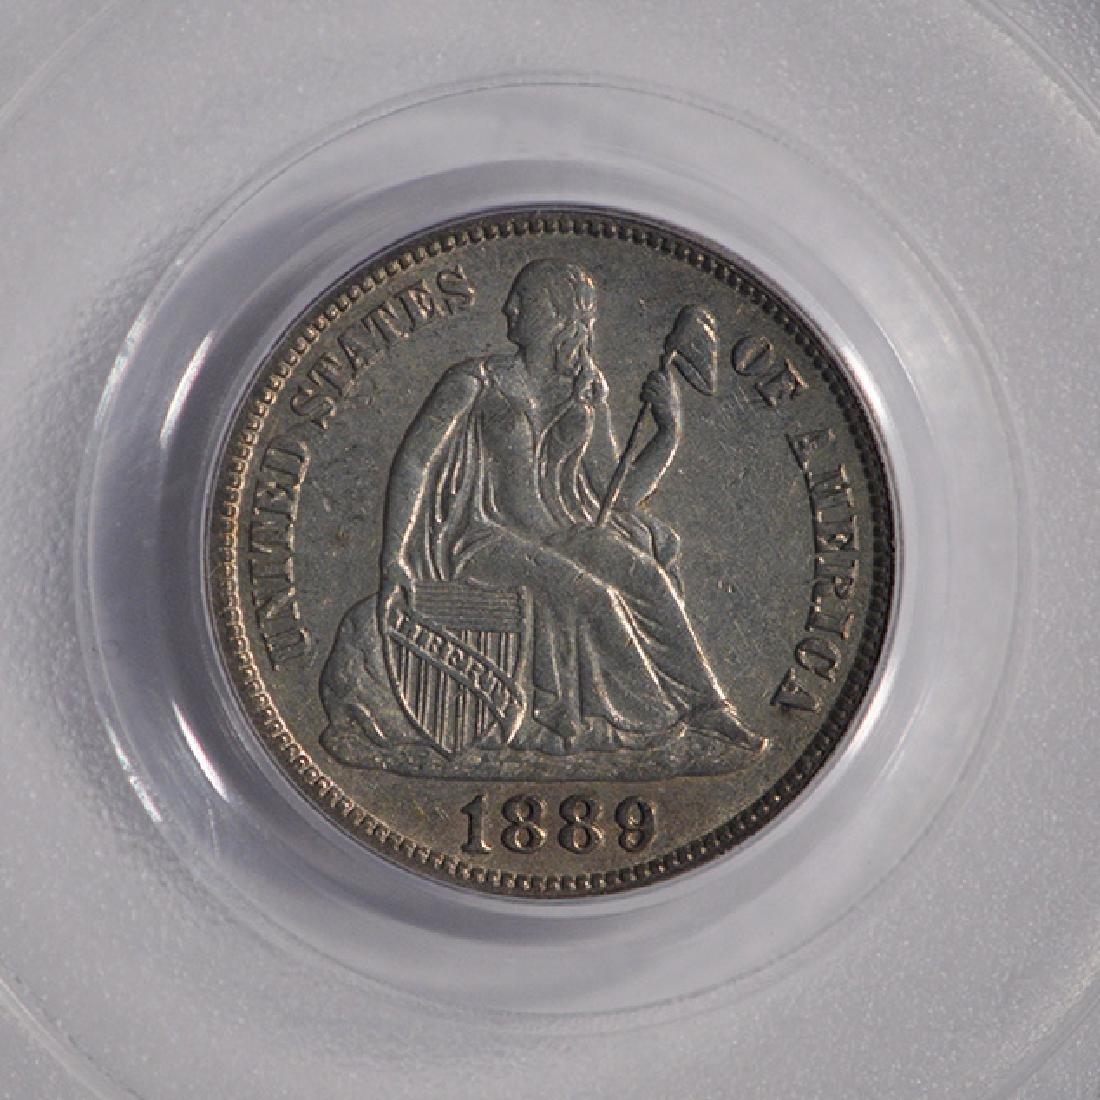 1889-S Seated Liberty Head Dime PCGS AU53 - 3